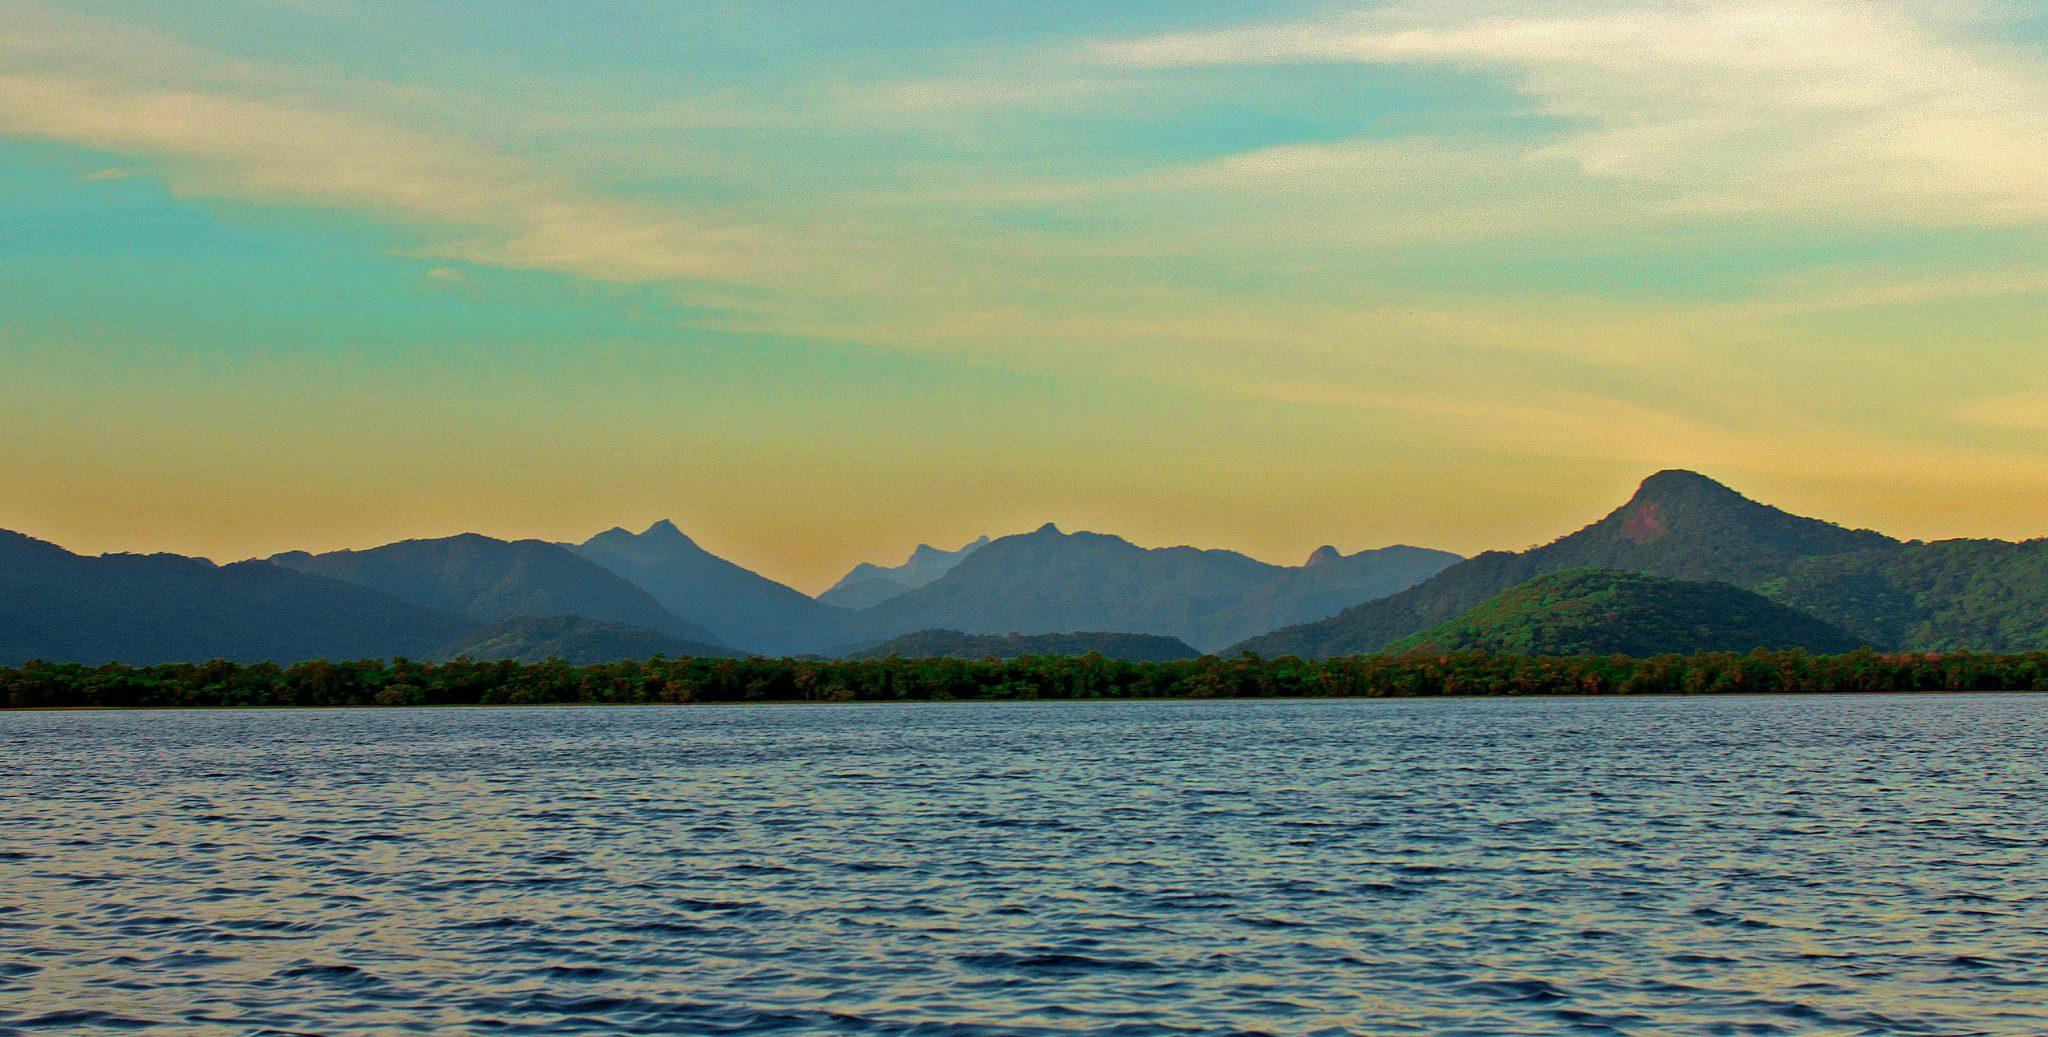 imagem da baía de Guaraqueçaba cercada de mata atlântica